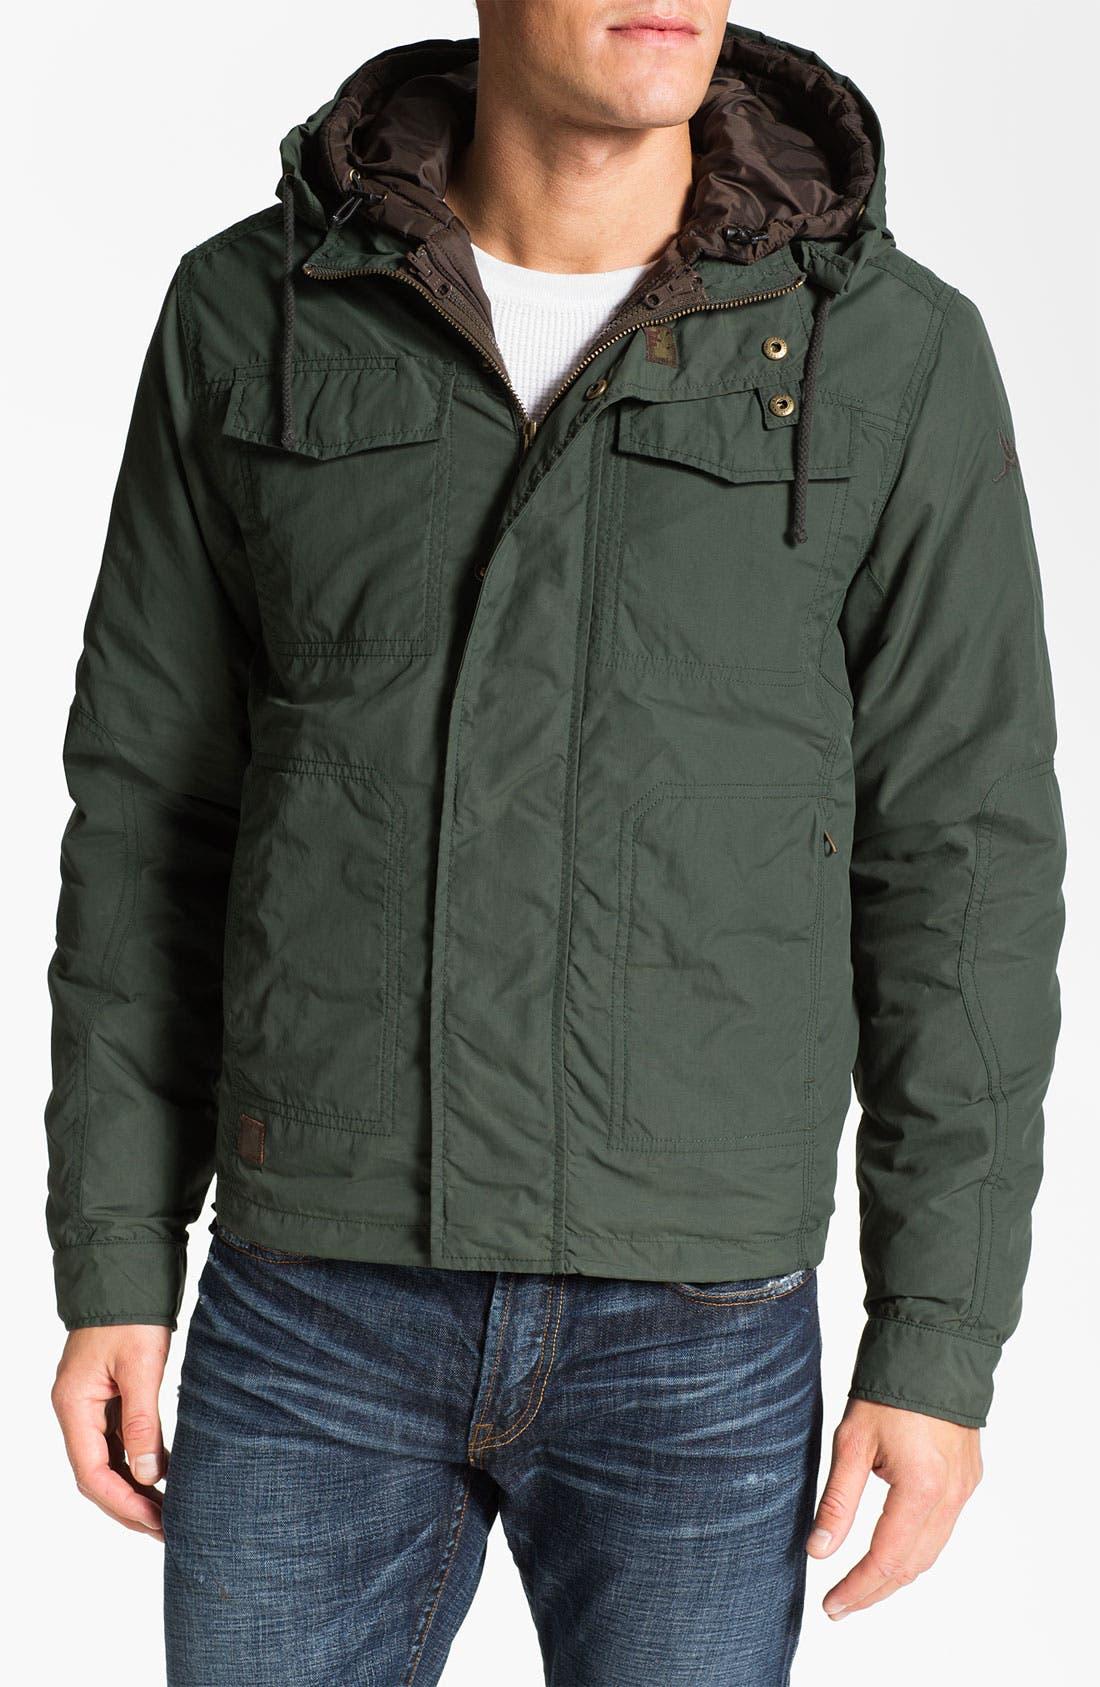 Alternate Image 1 Selected - Spiewak 'Carson' Field Jacket